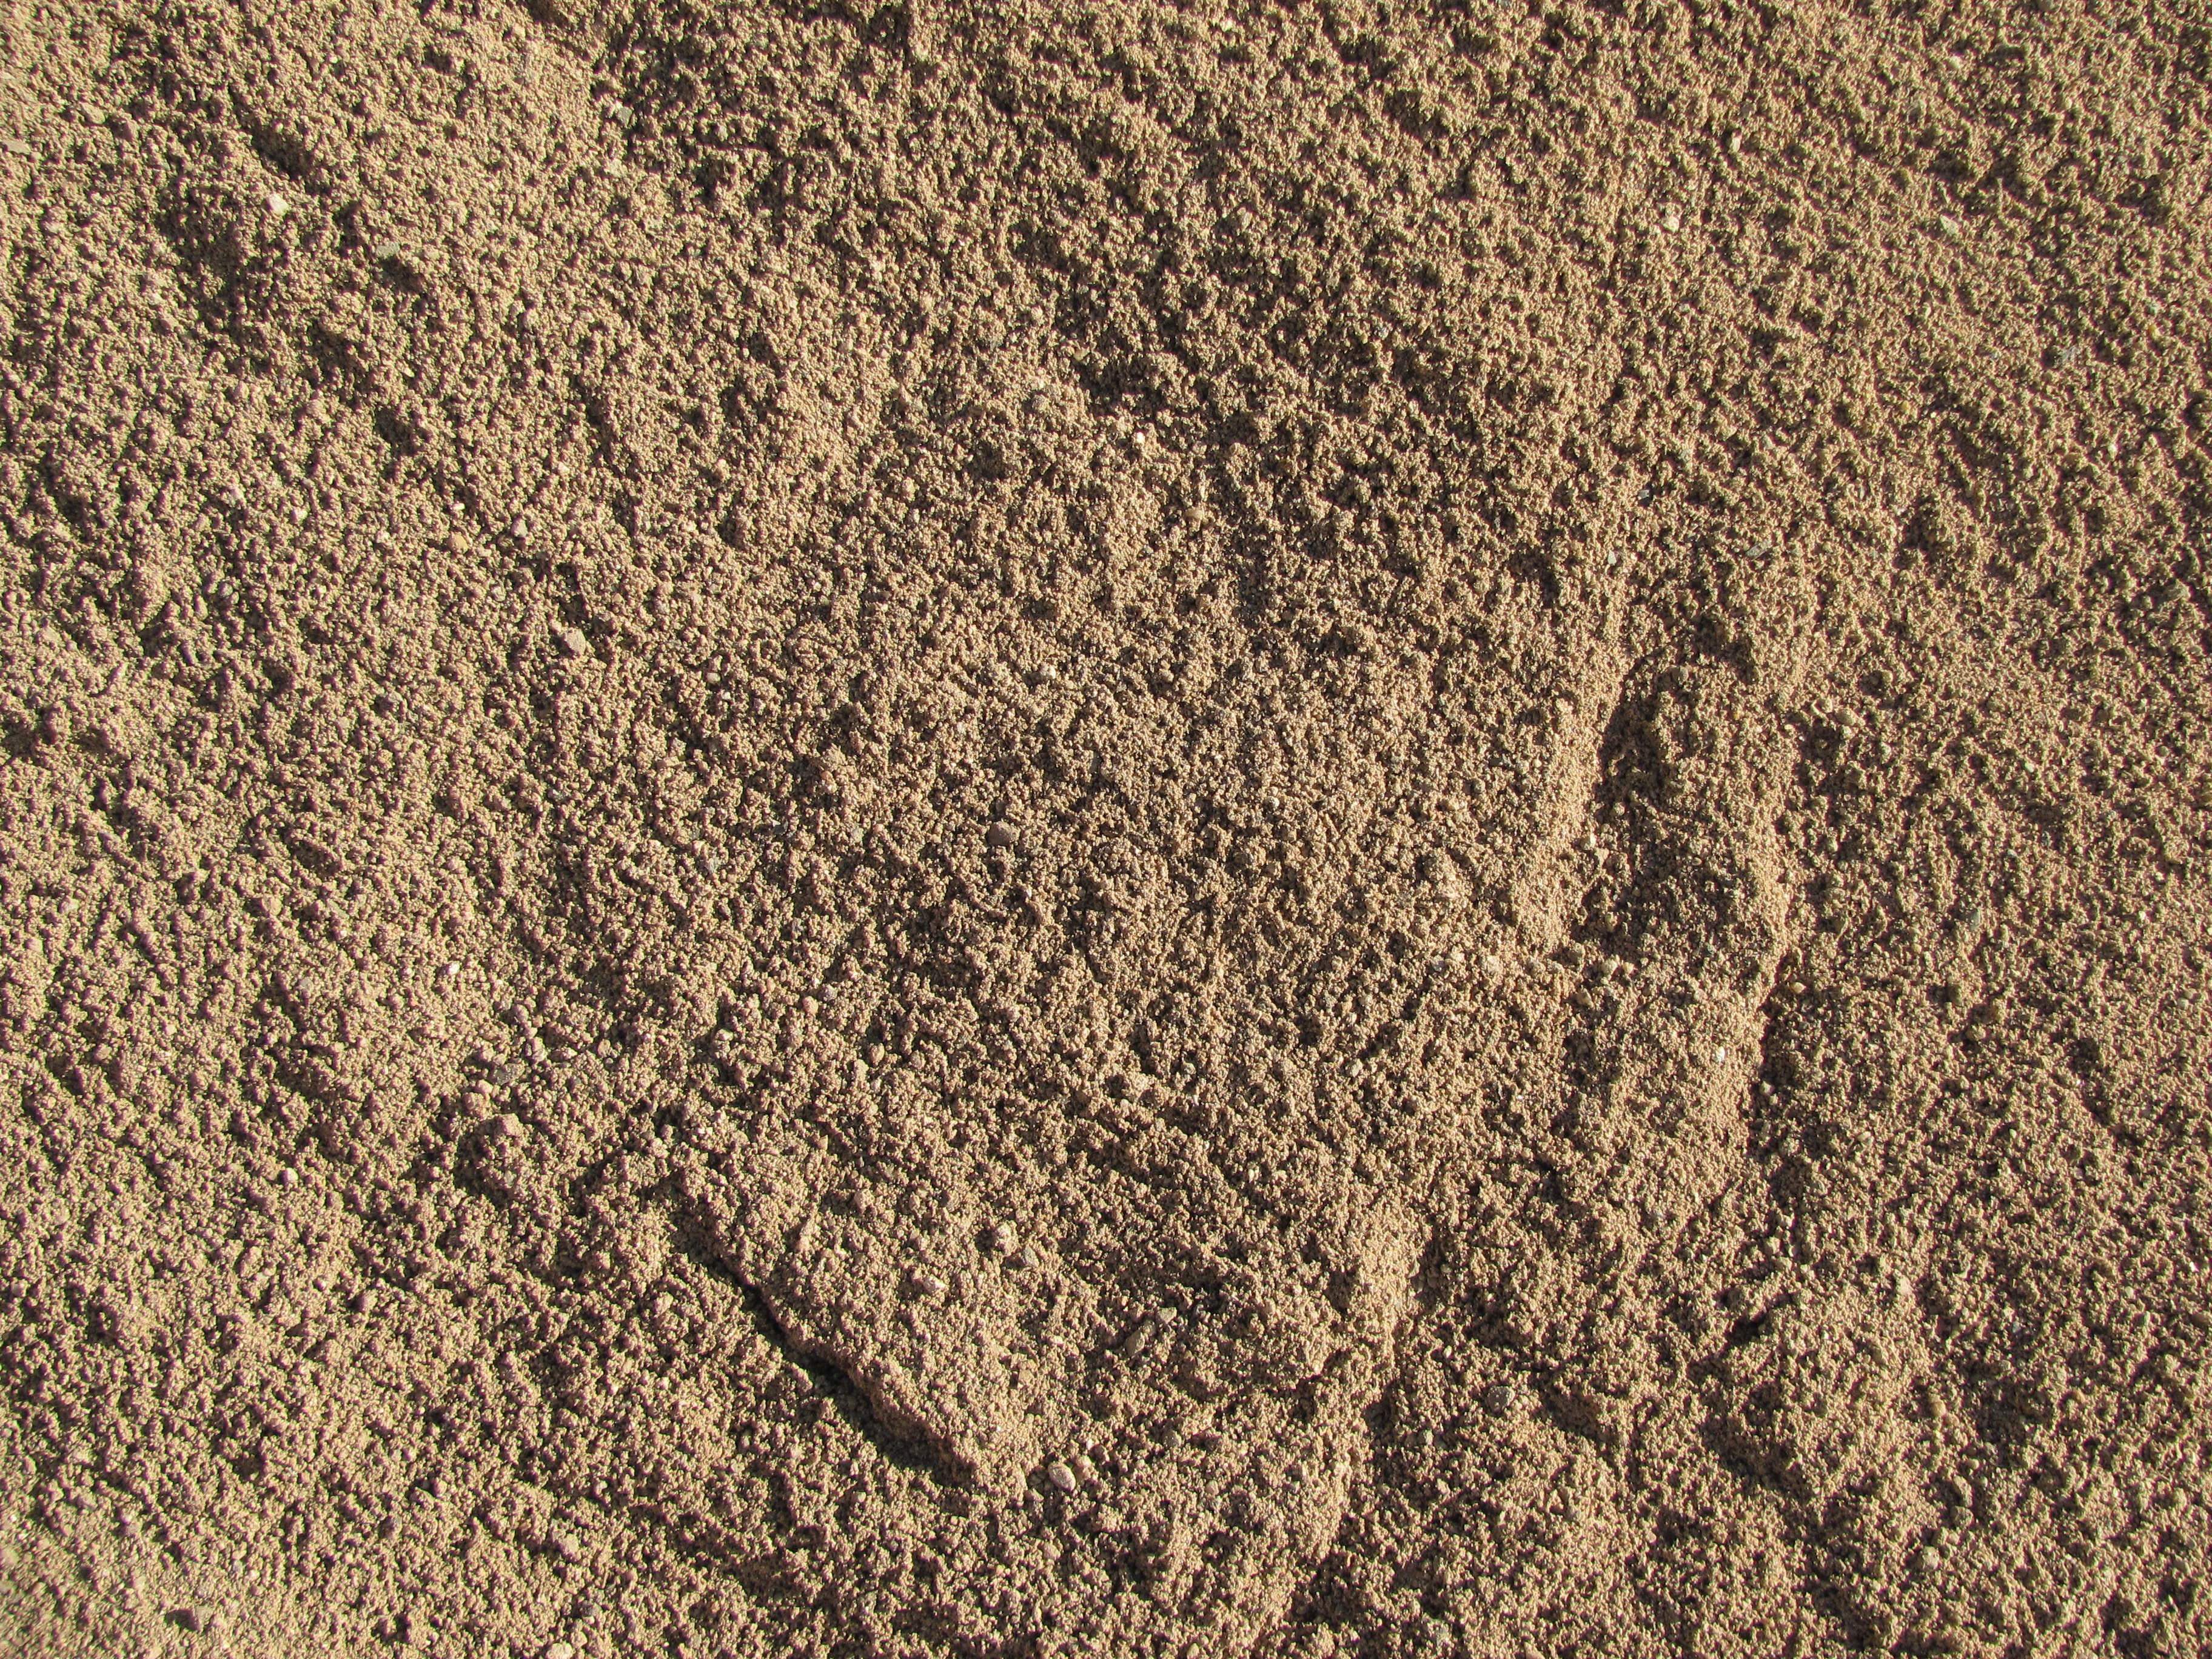 Freshwater Coarse Sand